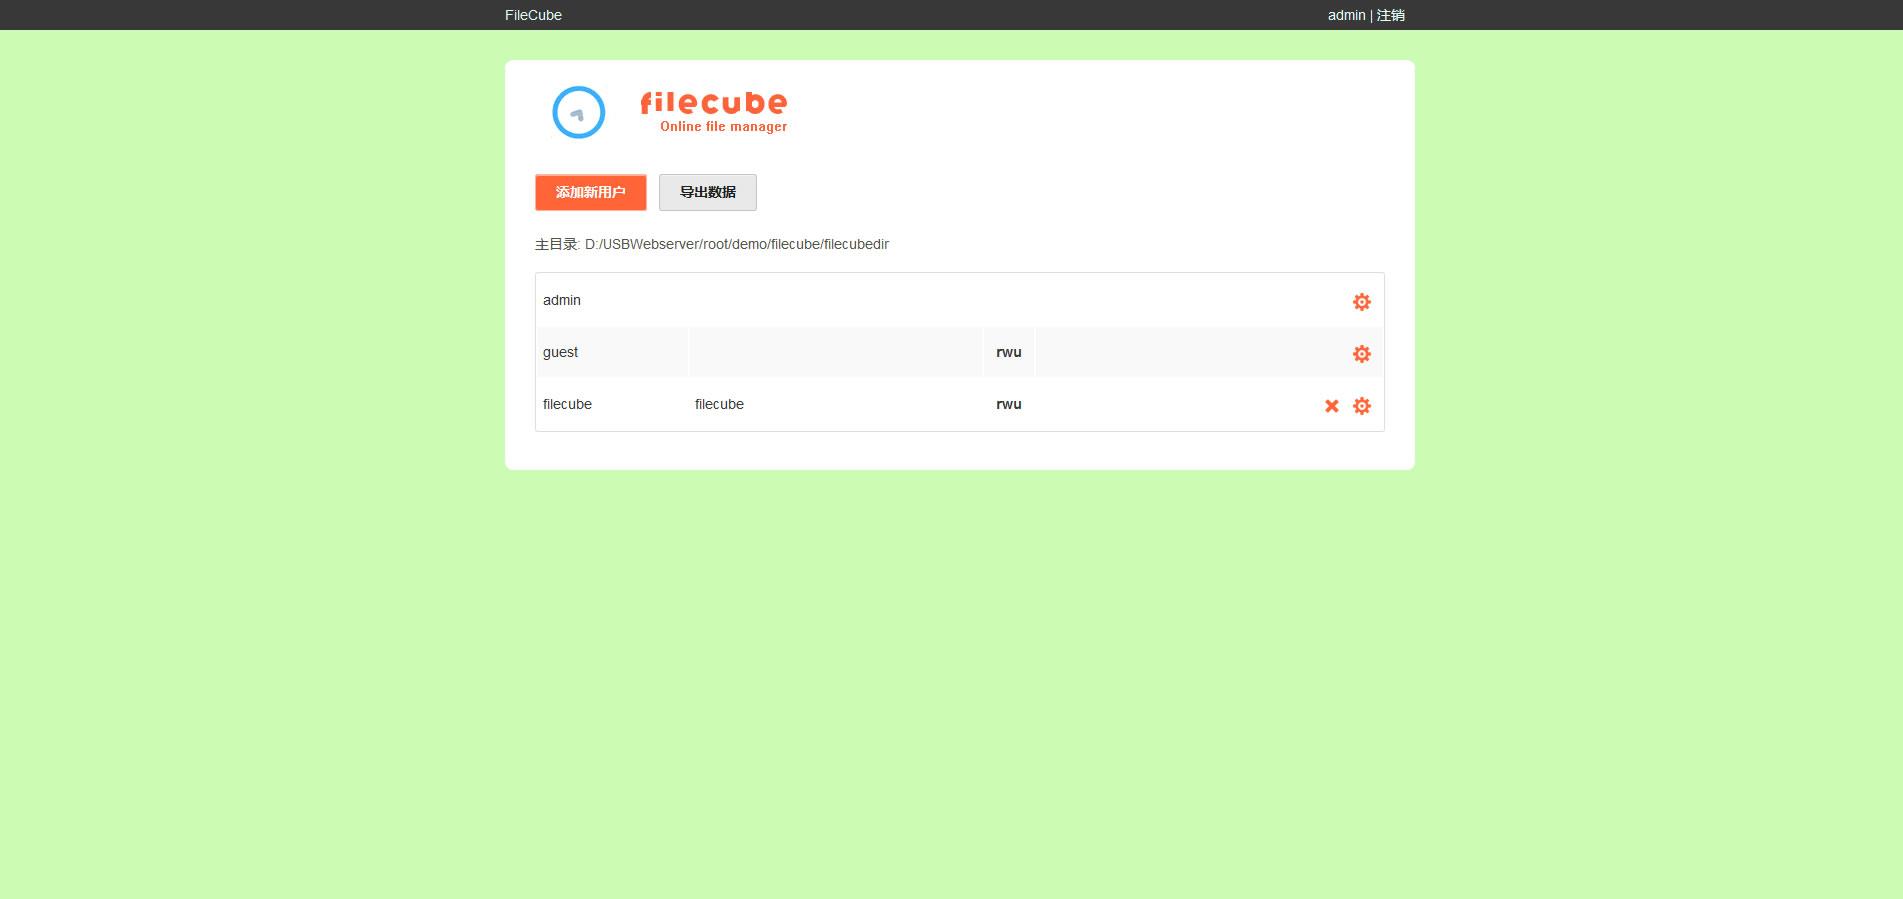 filecube screenshoot 14 - Filecube - 独立便捷PHP在线文件分享与外链管理系统